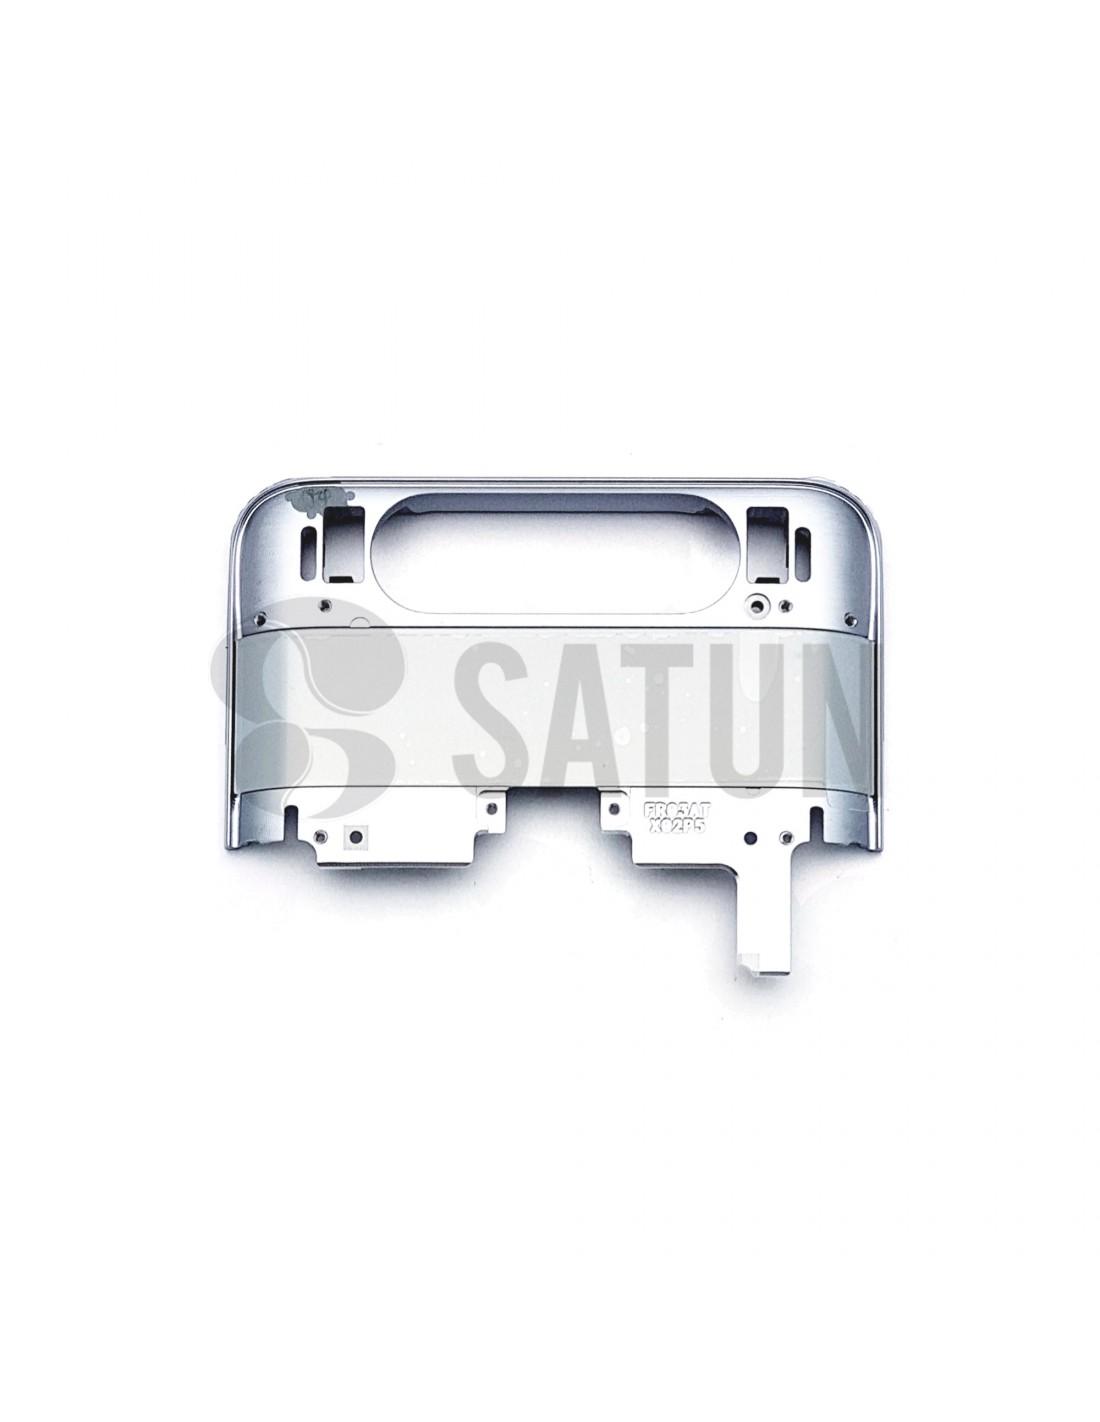 Carcasa intermedia superior Samsung Galaxy A80 plata